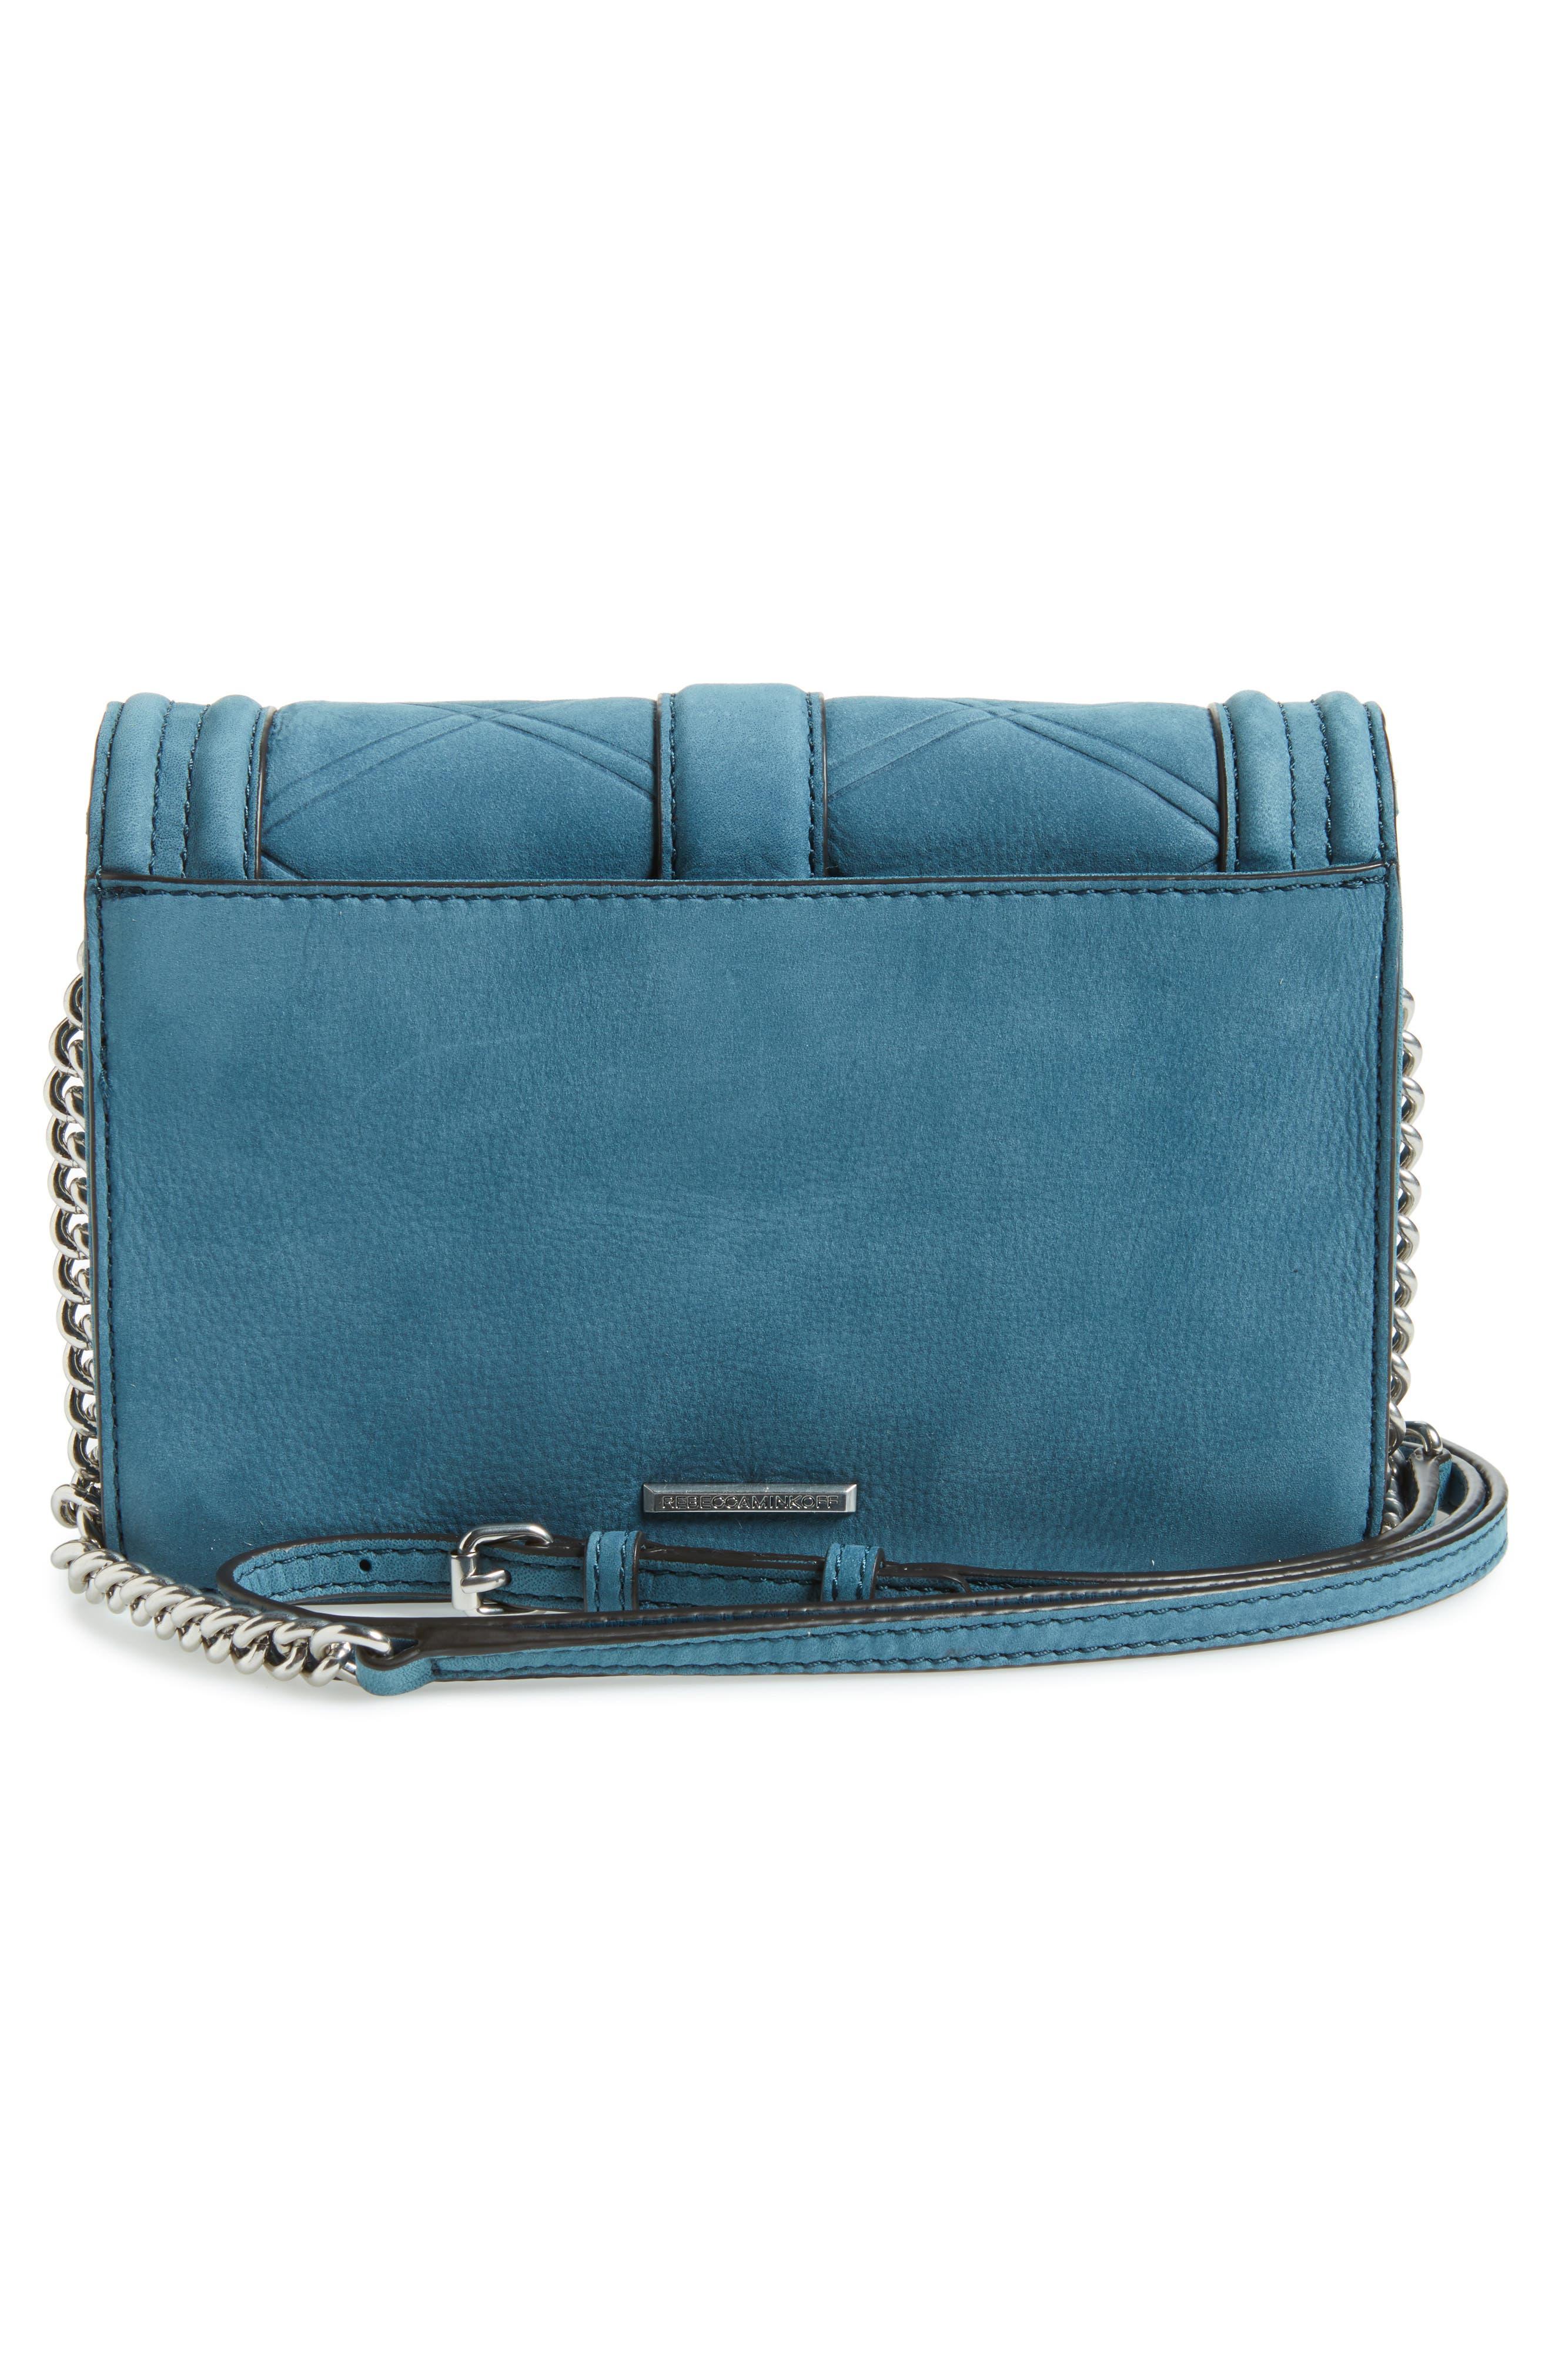 Alternate Image 3  - Rebecca Minkoff Small Love Nubuck Leather Crossbody Bag